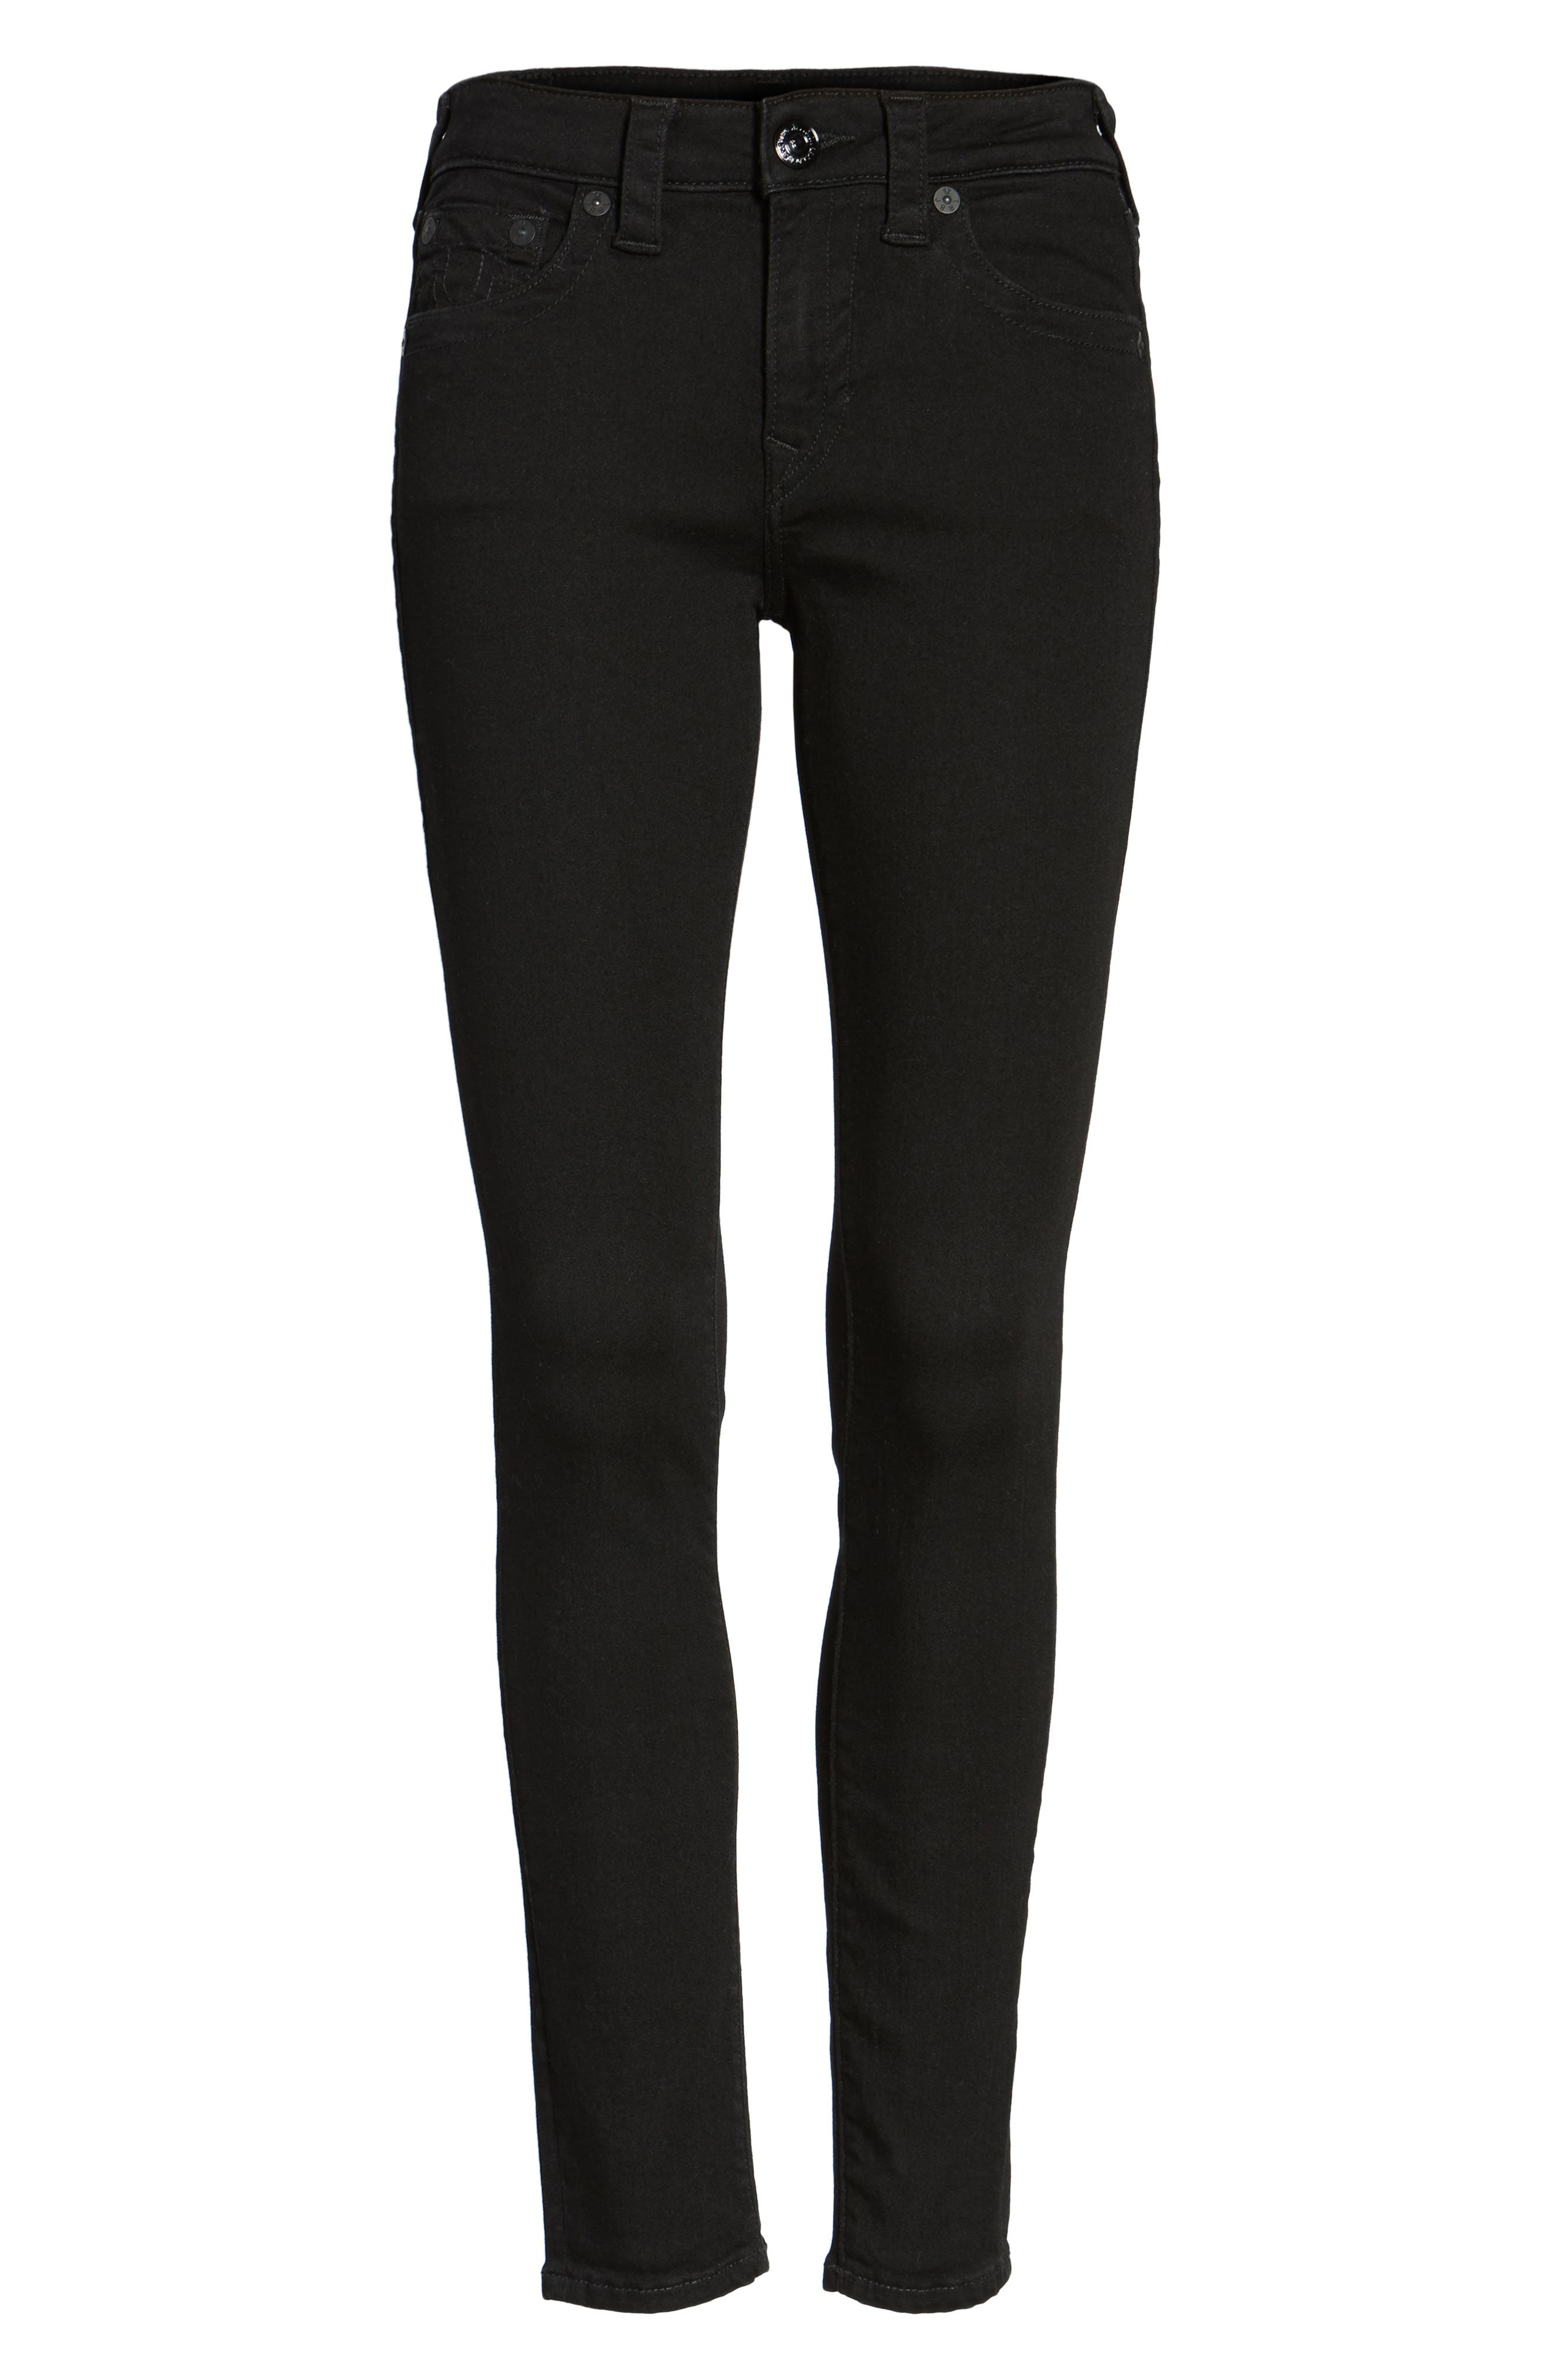 Jennie Curvy Skinny Jeans,                             Alternate thumbnail 5, color,                             Way Back Black